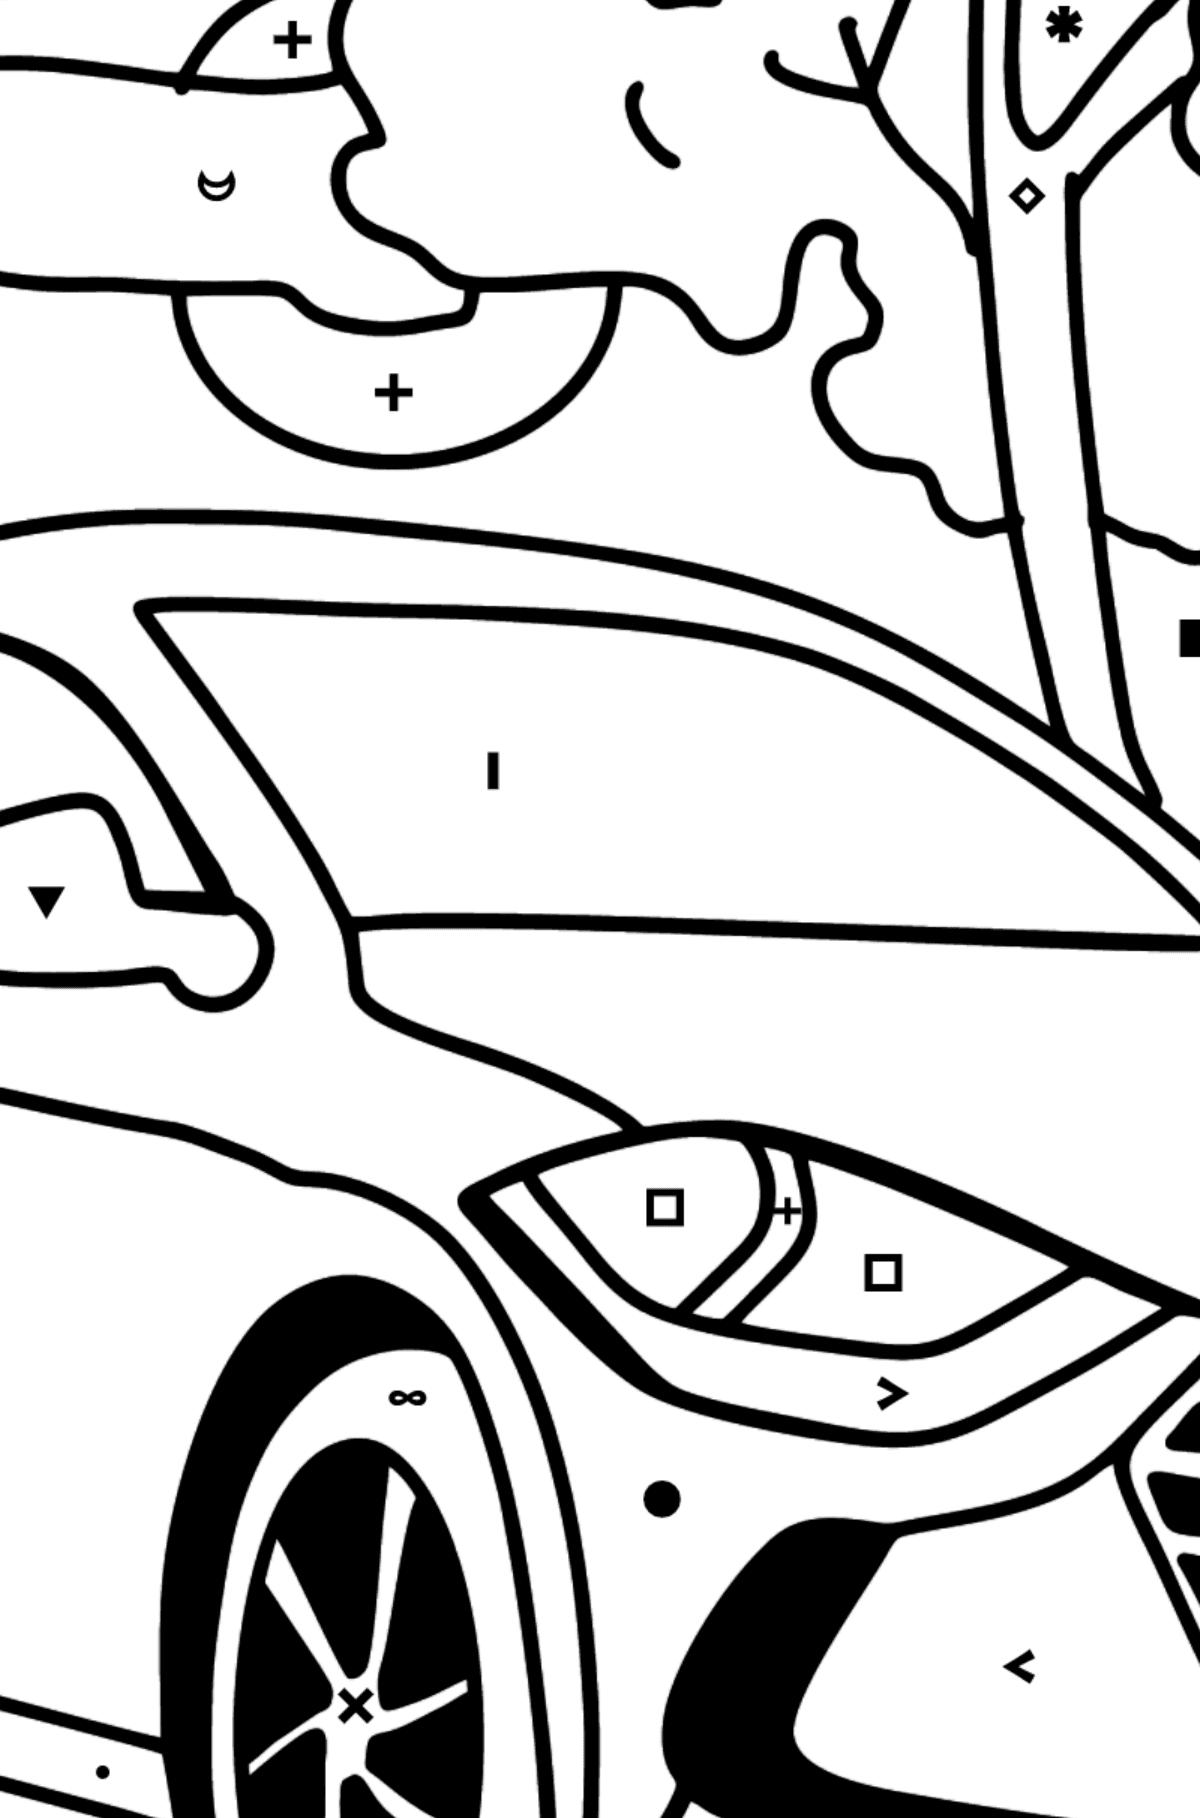 Hyundai car coloring page - Coloring by Symbols for Kids